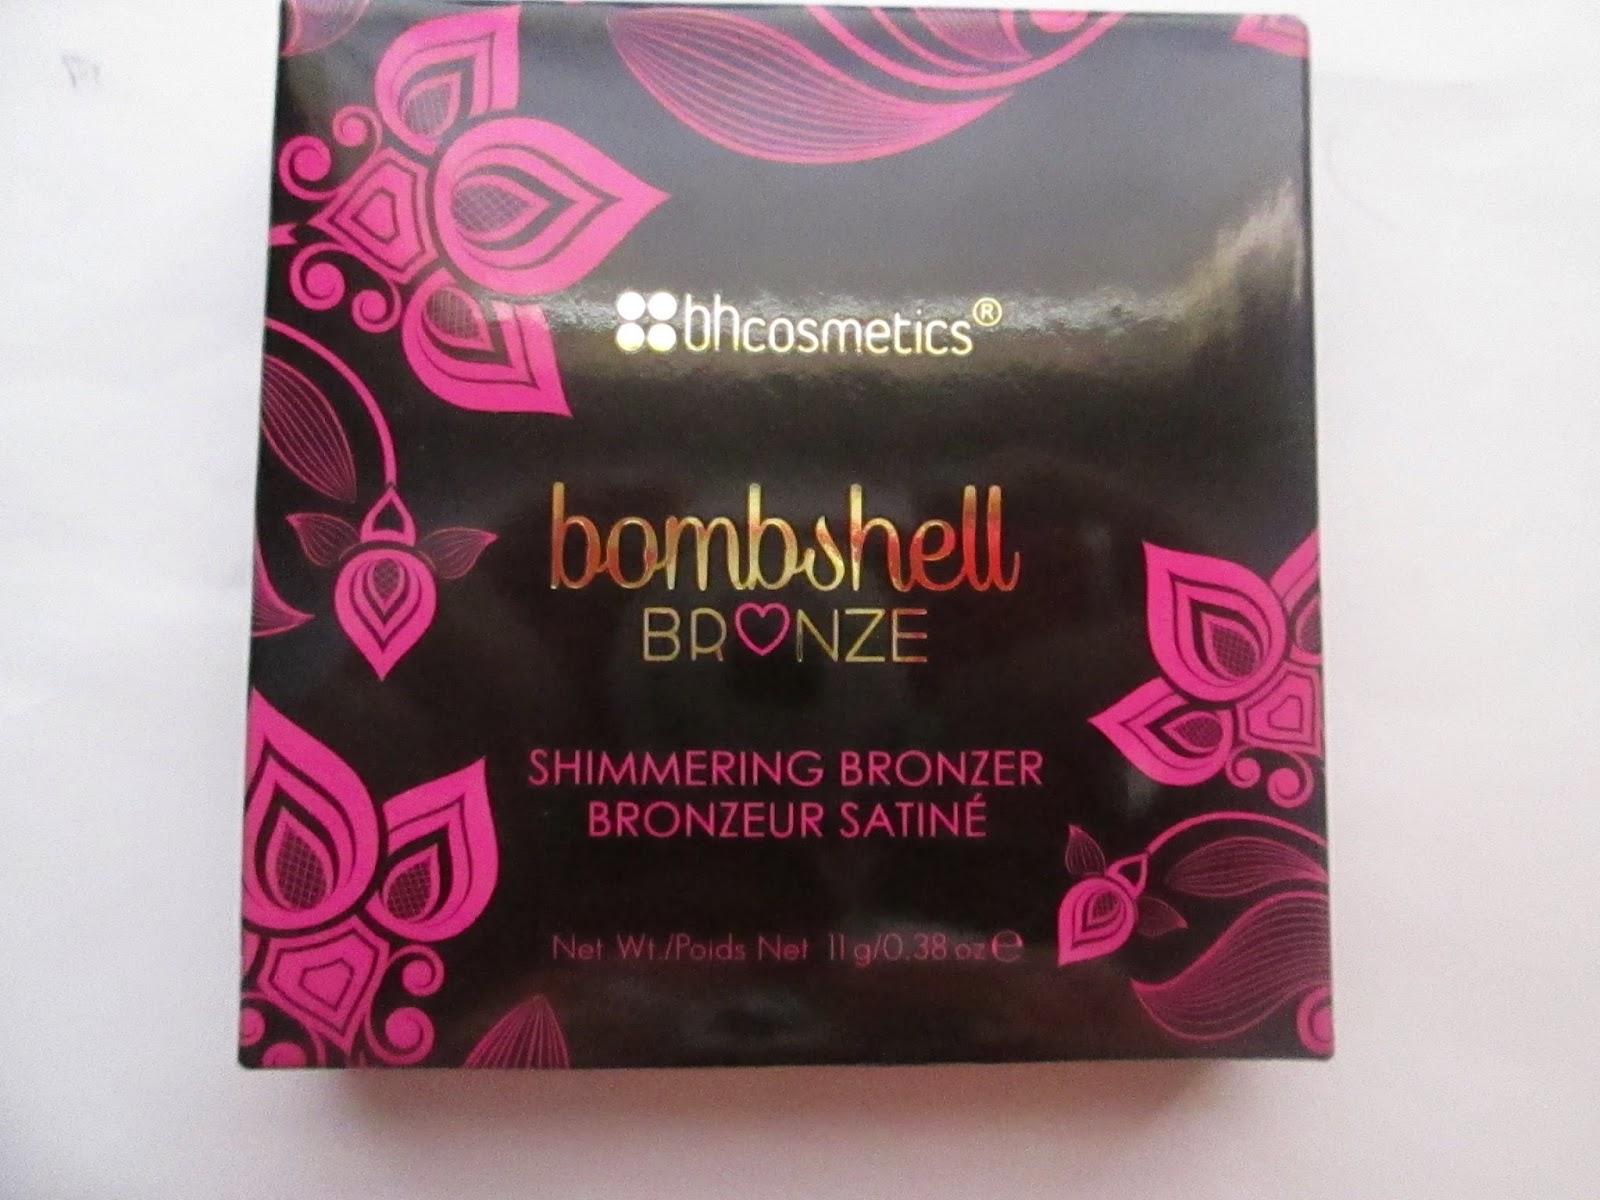 Bombshell Bronze Bronzer by BH Cosmetics #19